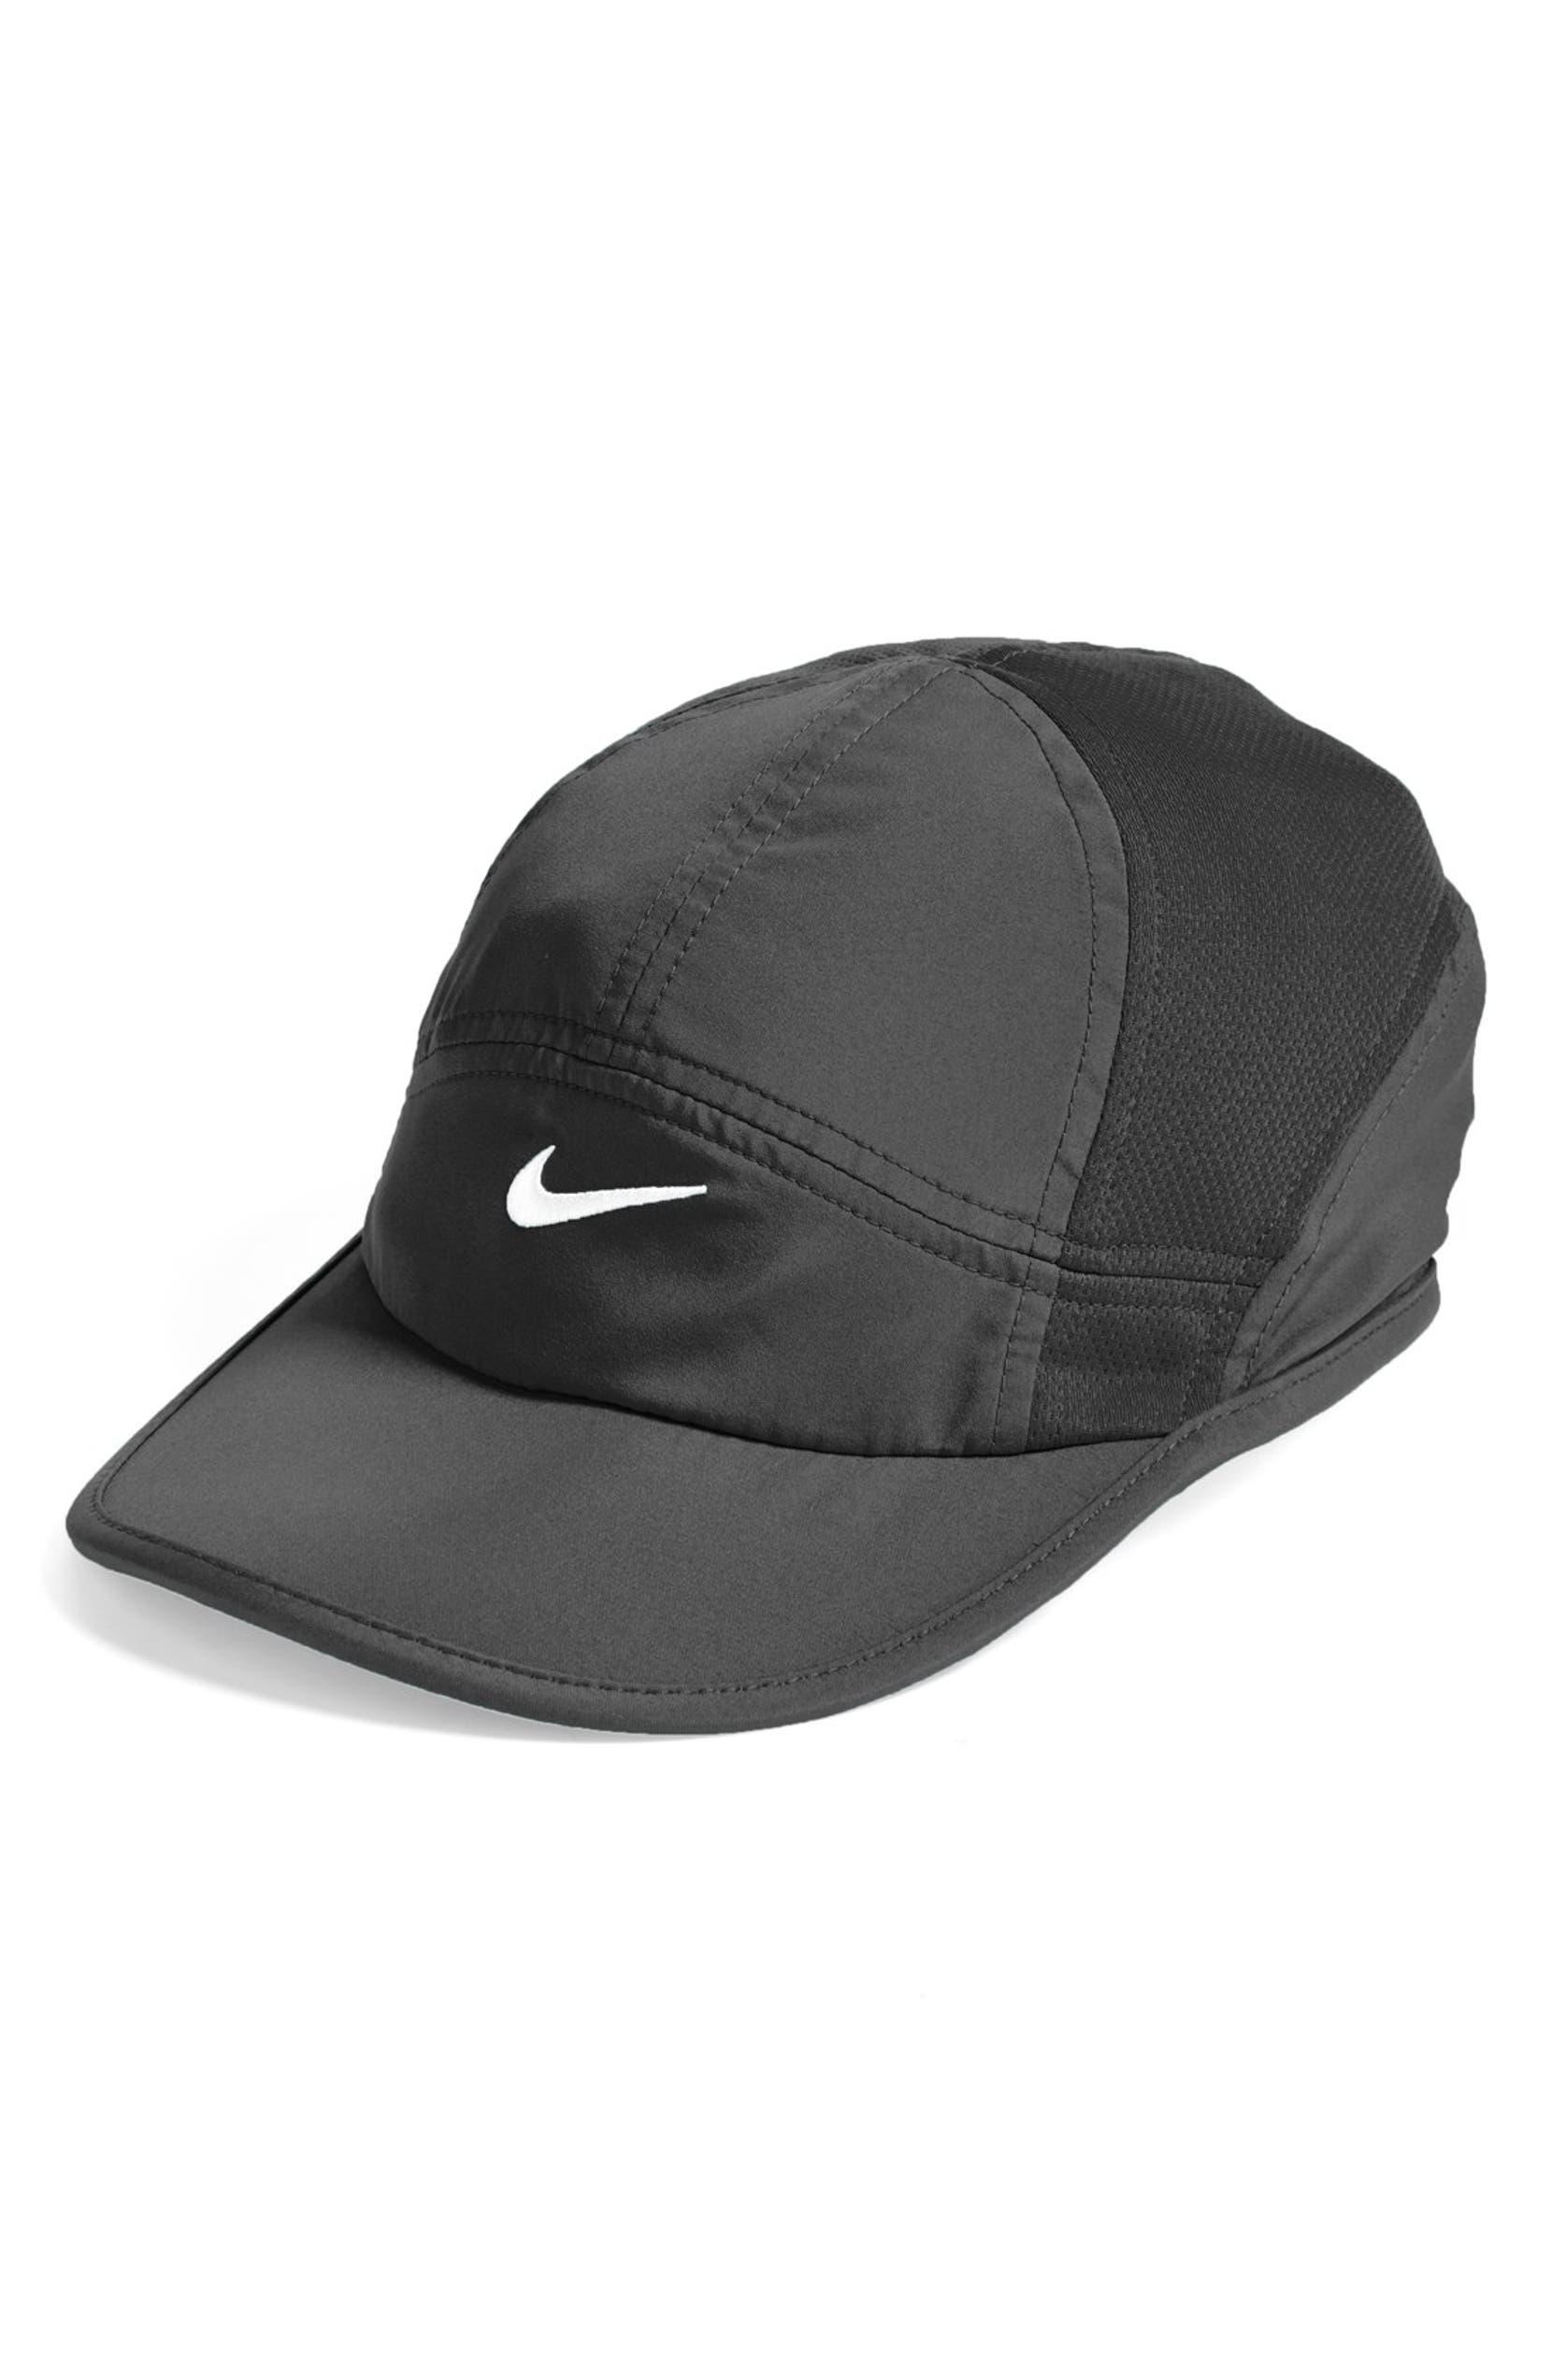 Nike  Featherlight 2.0  Dri-FIT Cap  ca1c6f0f1c0a